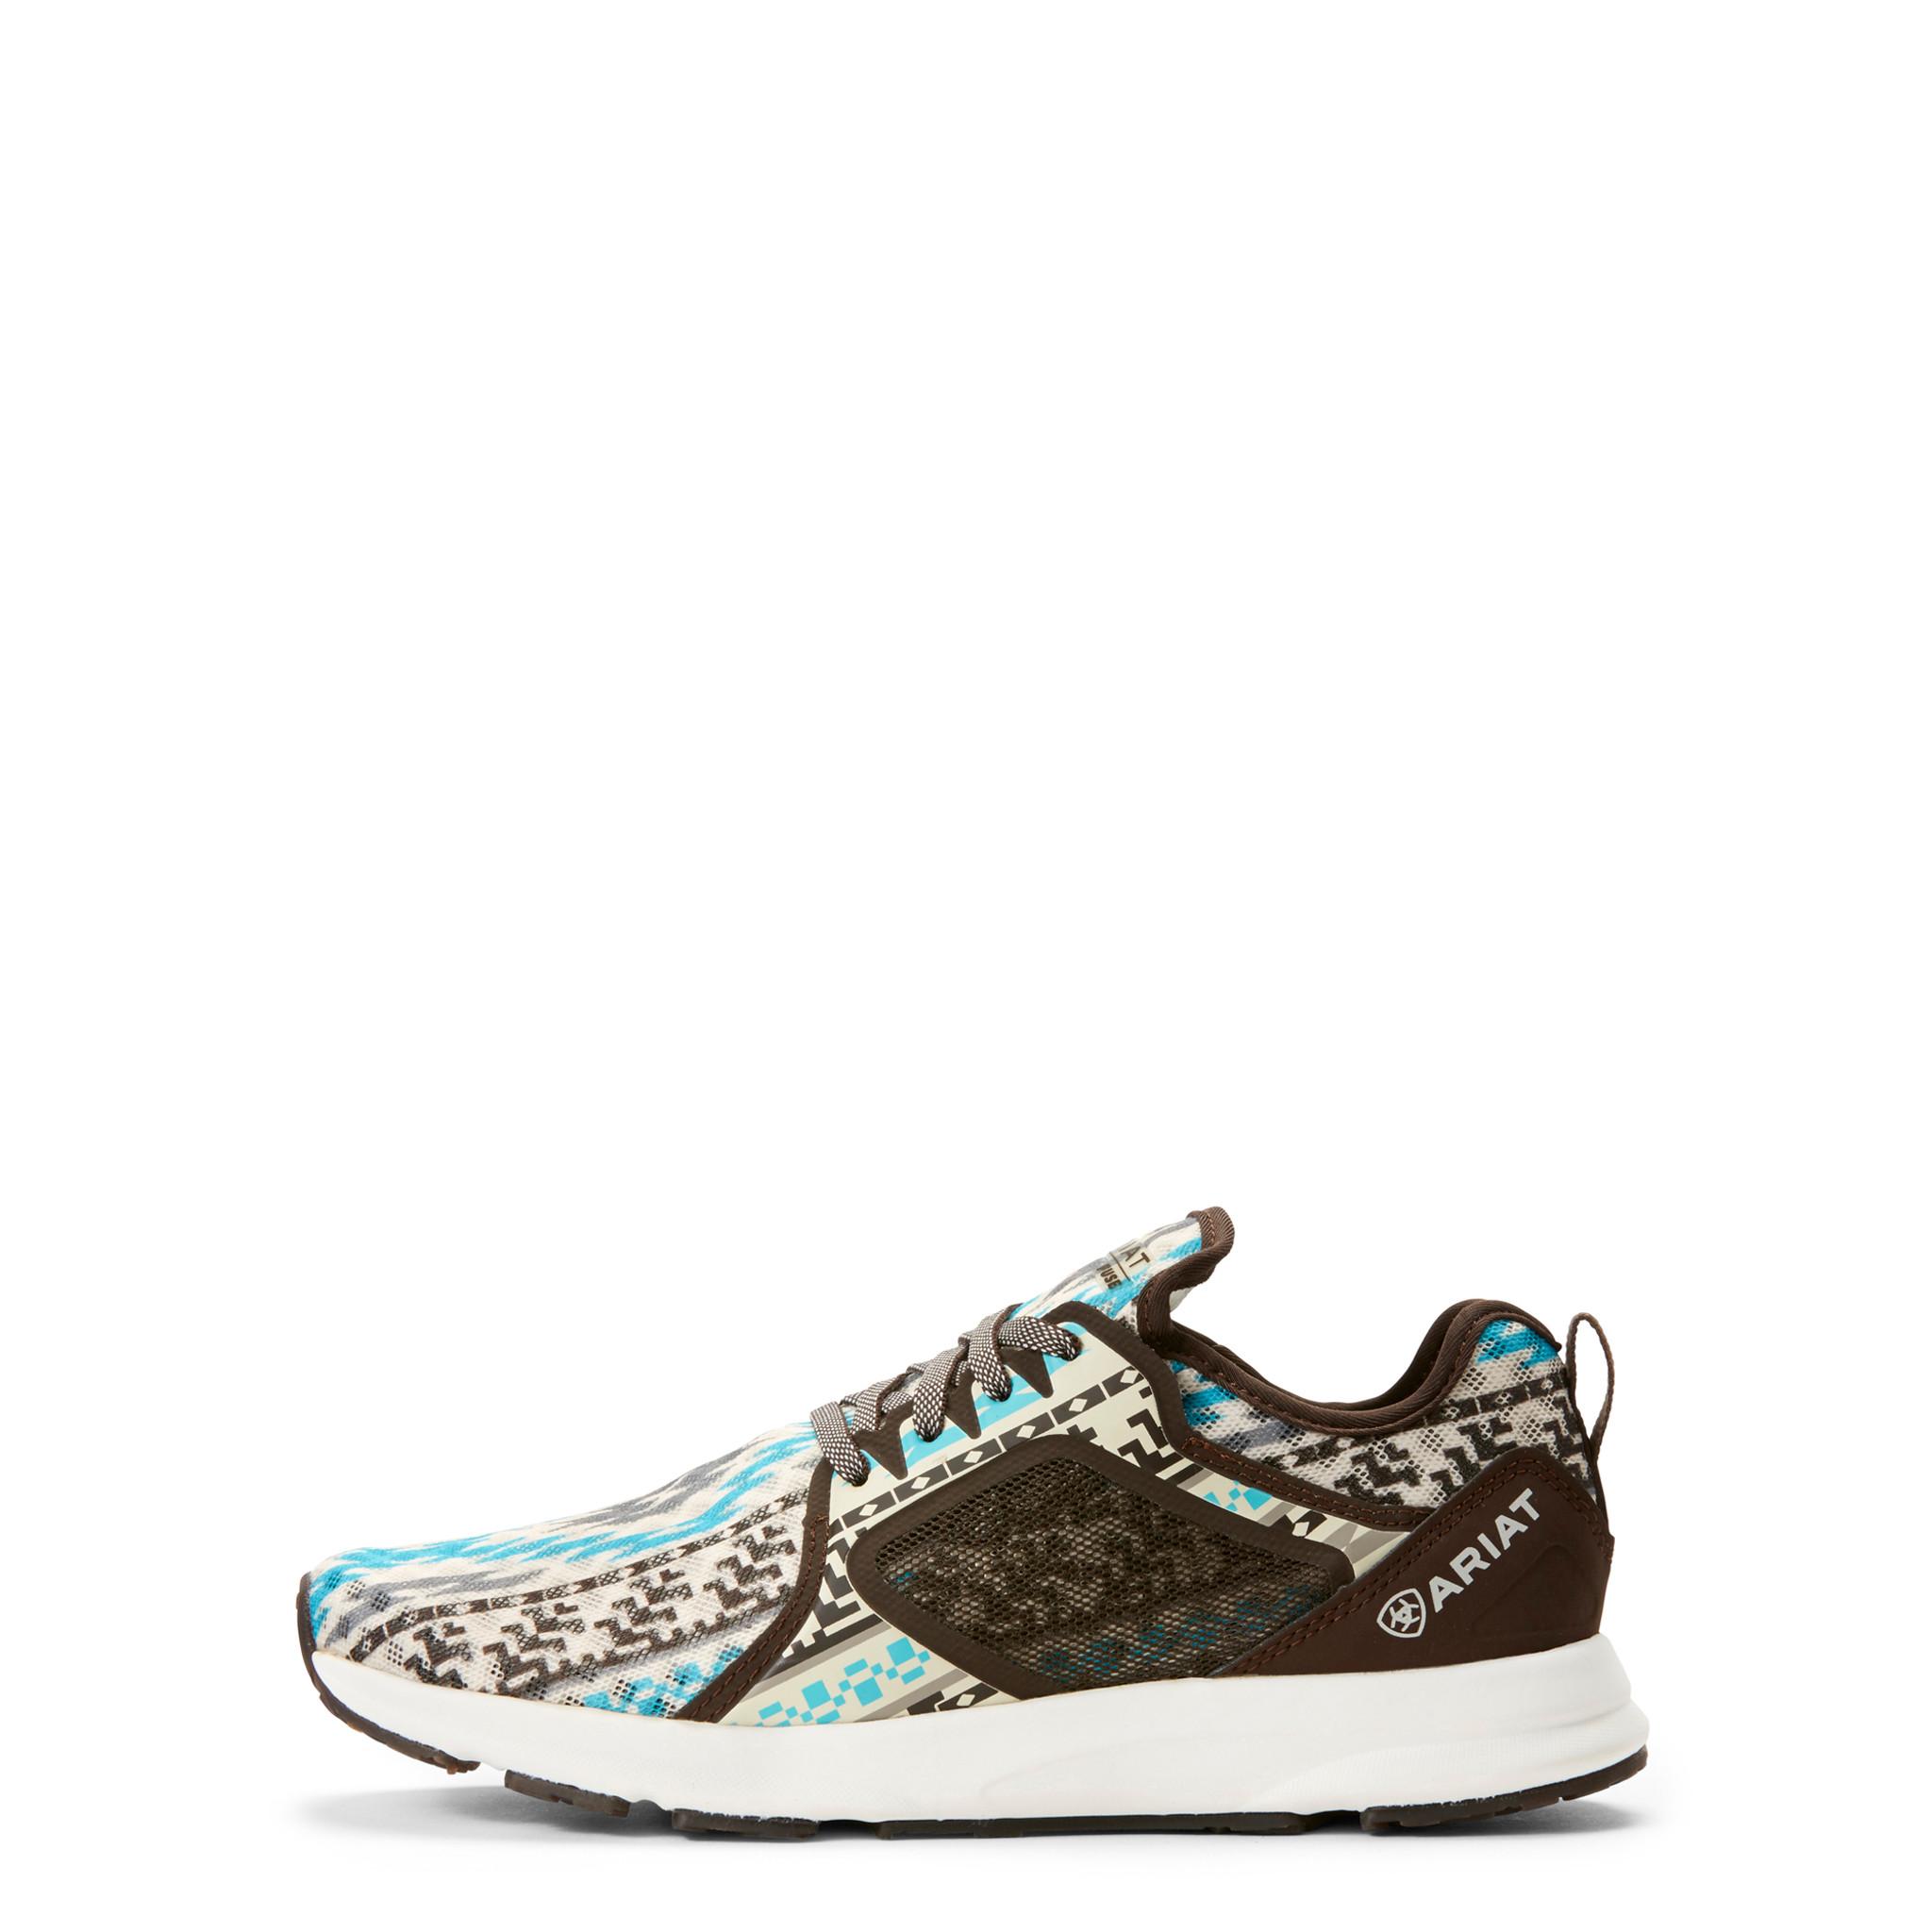 mens ariat tennis shoes